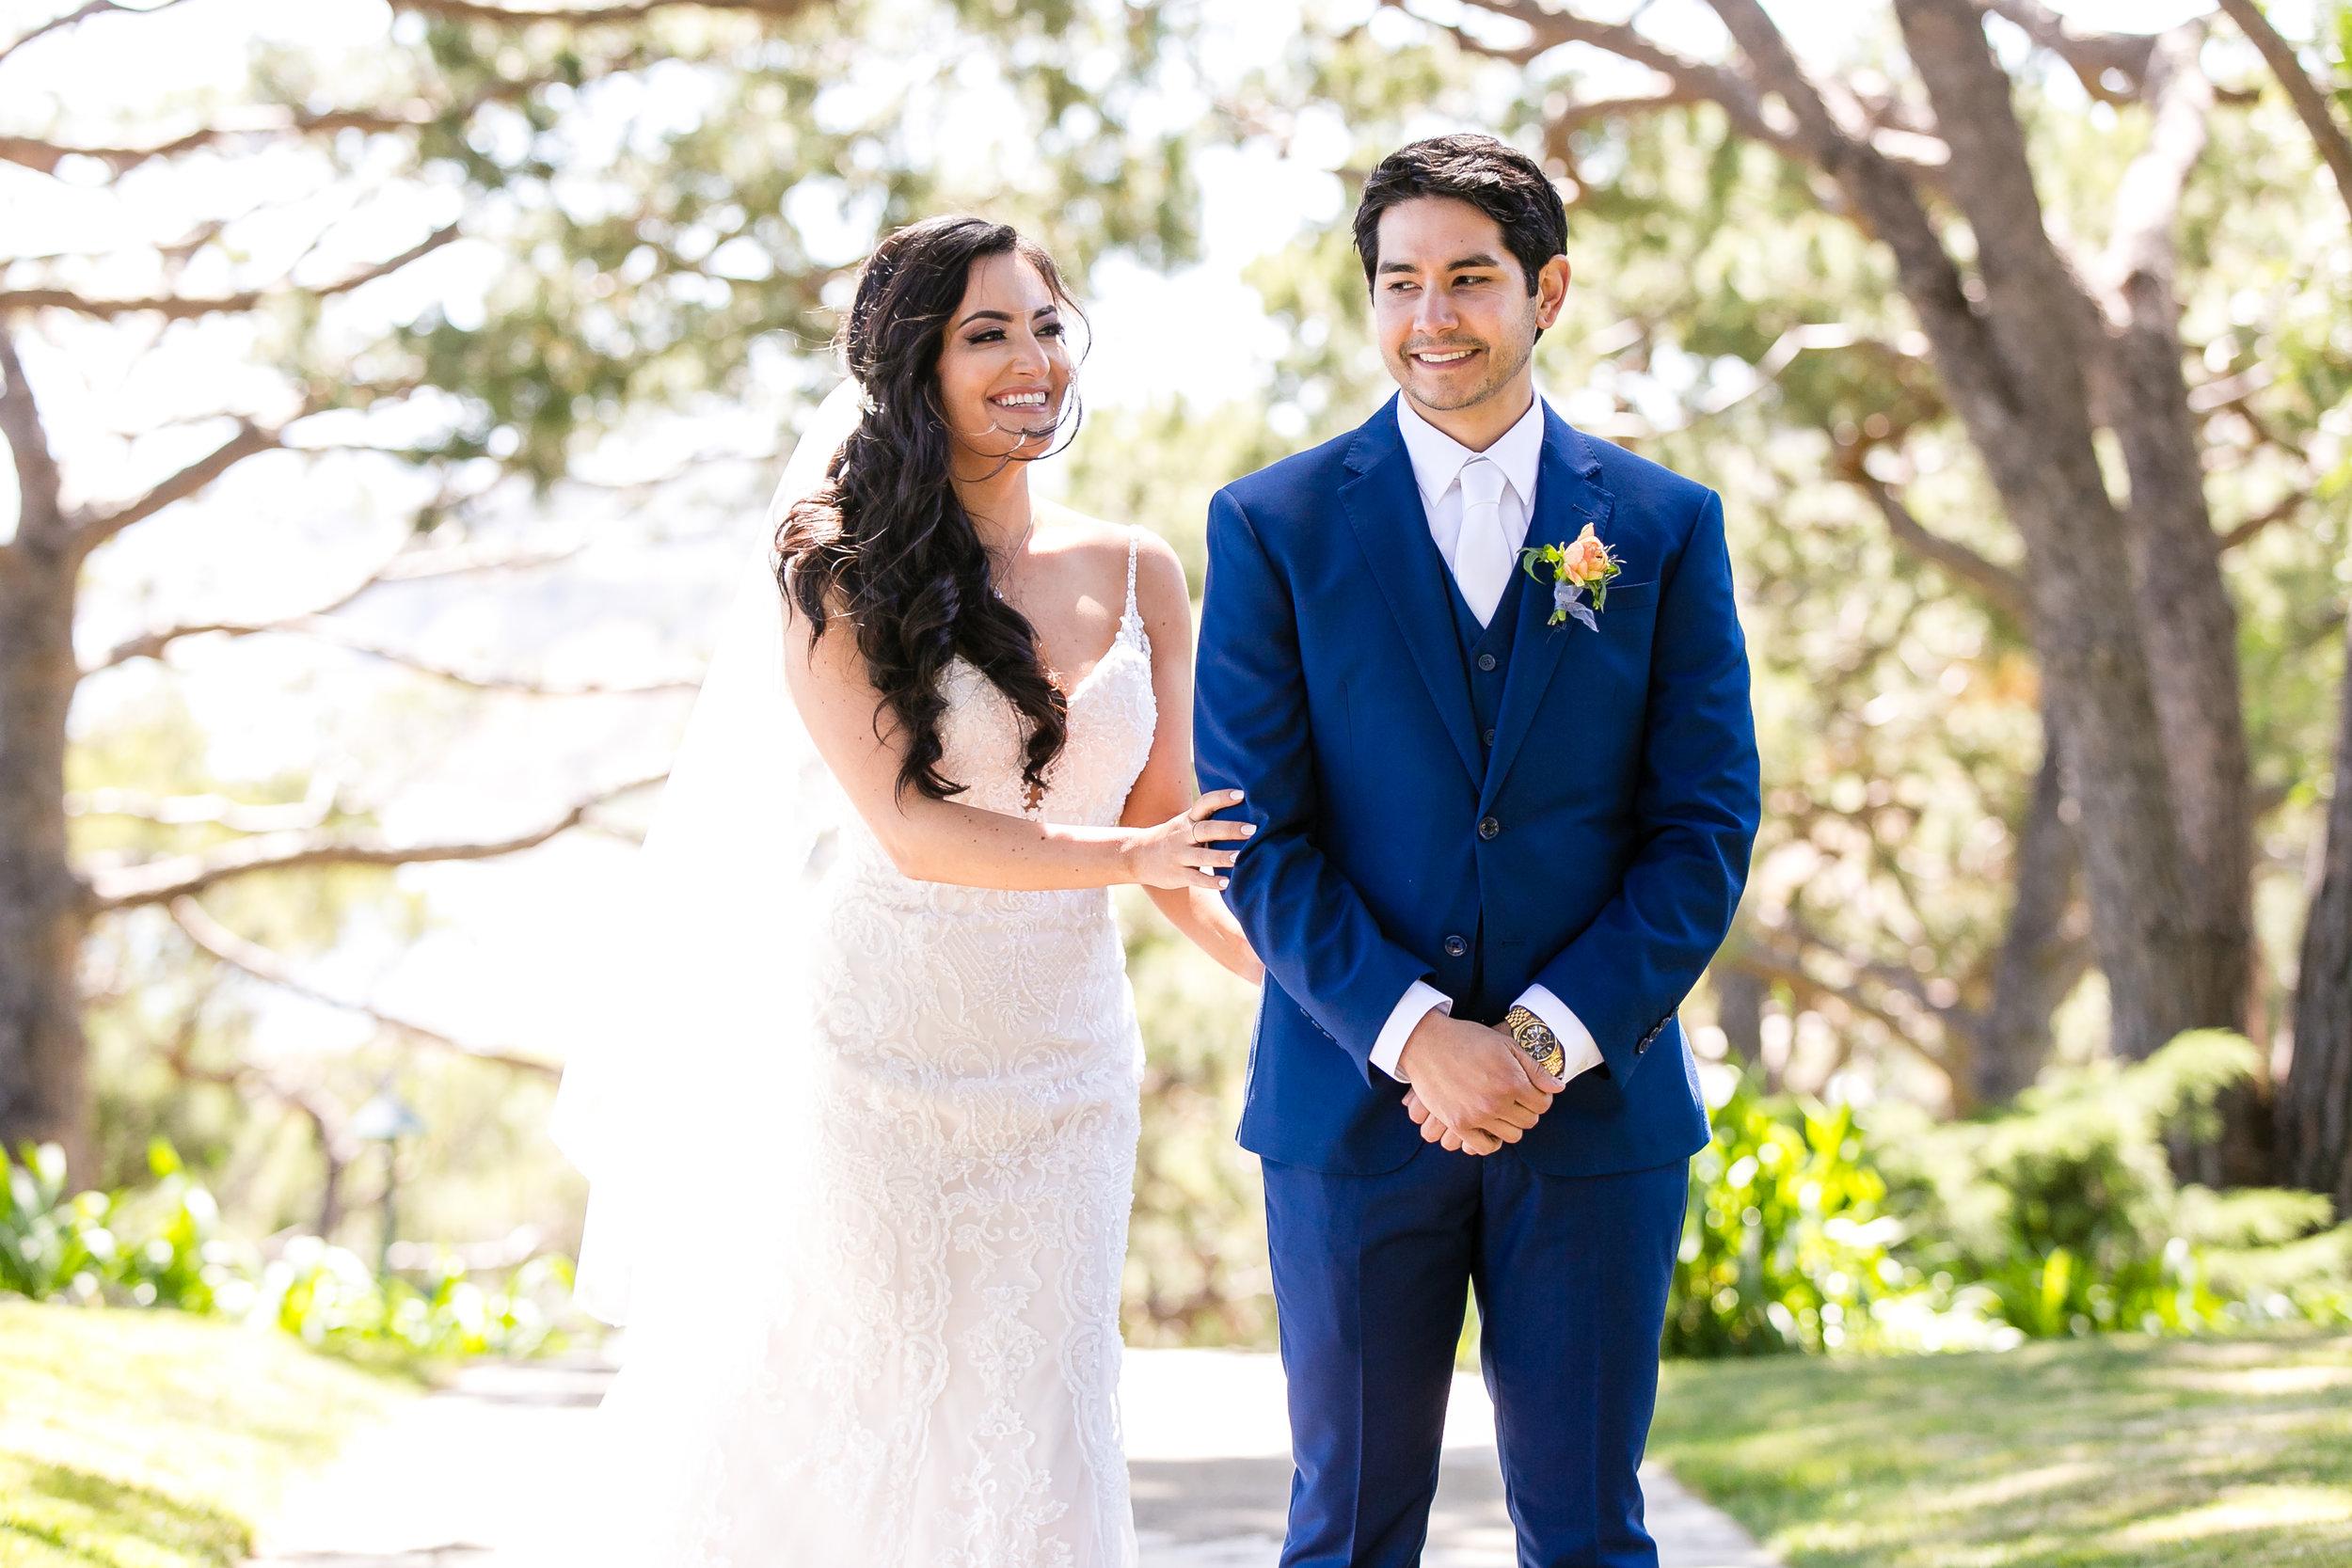 2019_05_24_Wedding_Barajas_0318.jpg